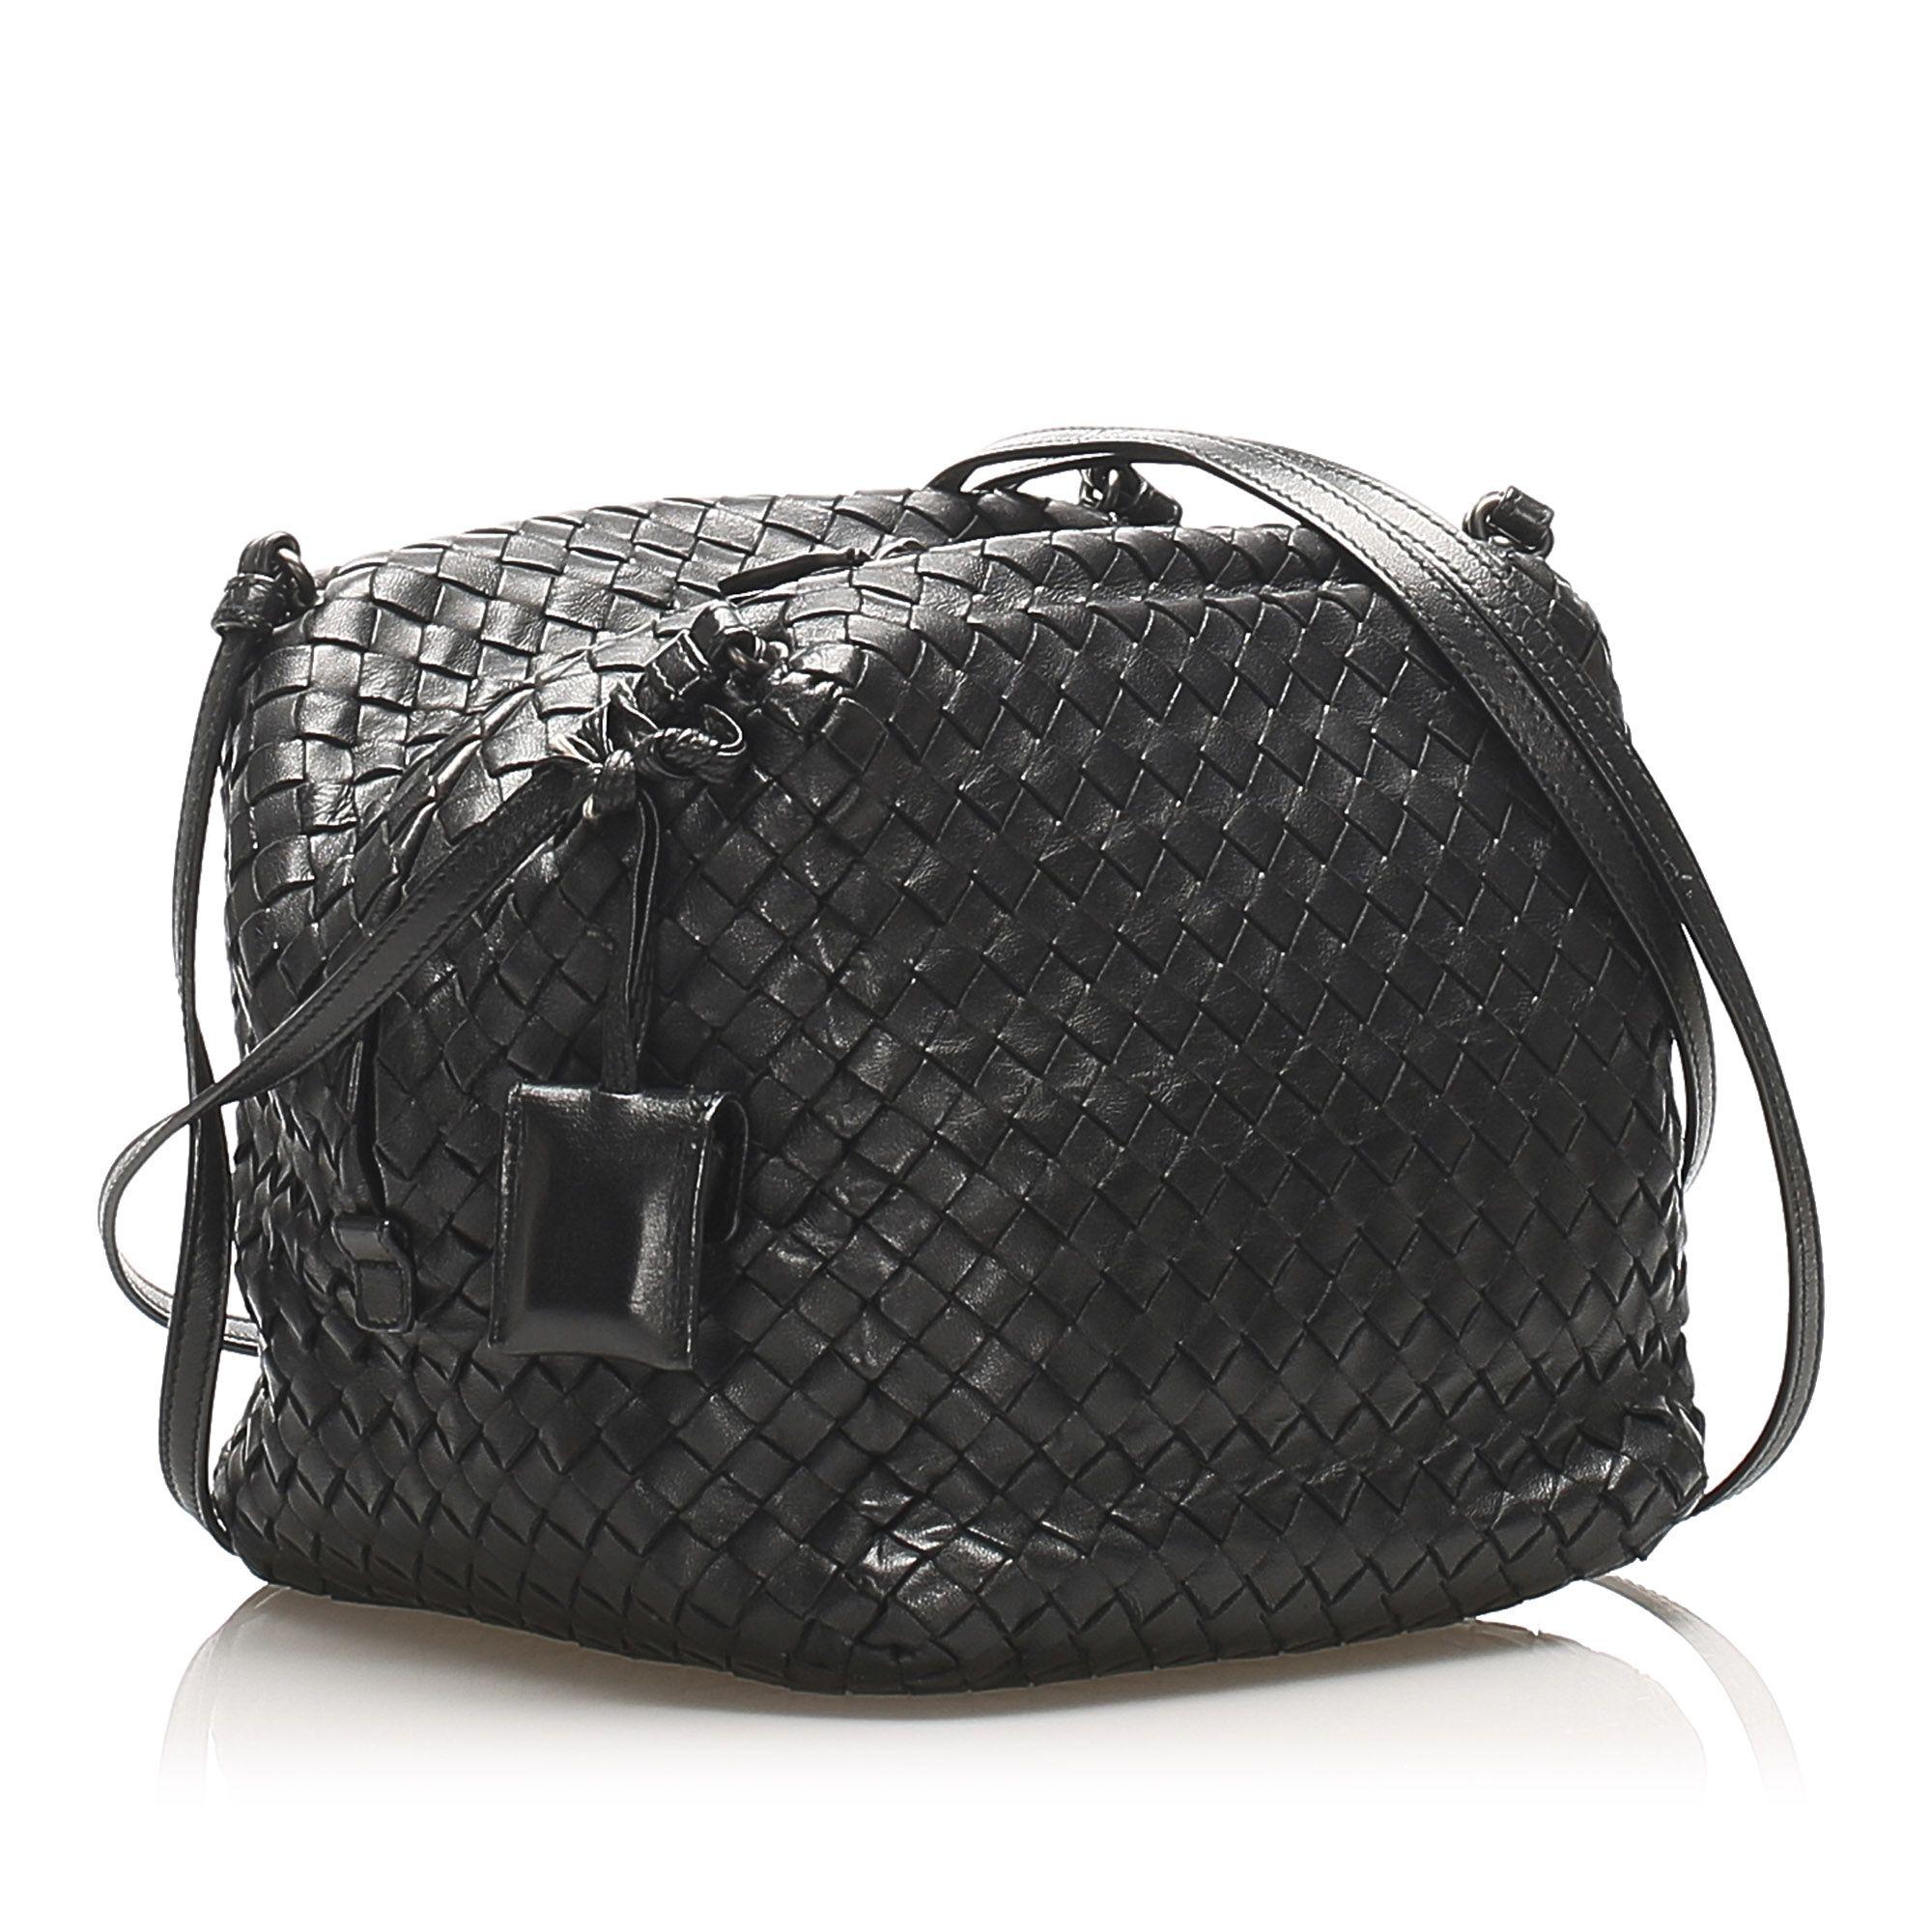 Vintage Bottega Veneta Intrecciato Leather Shoulder Bag Black